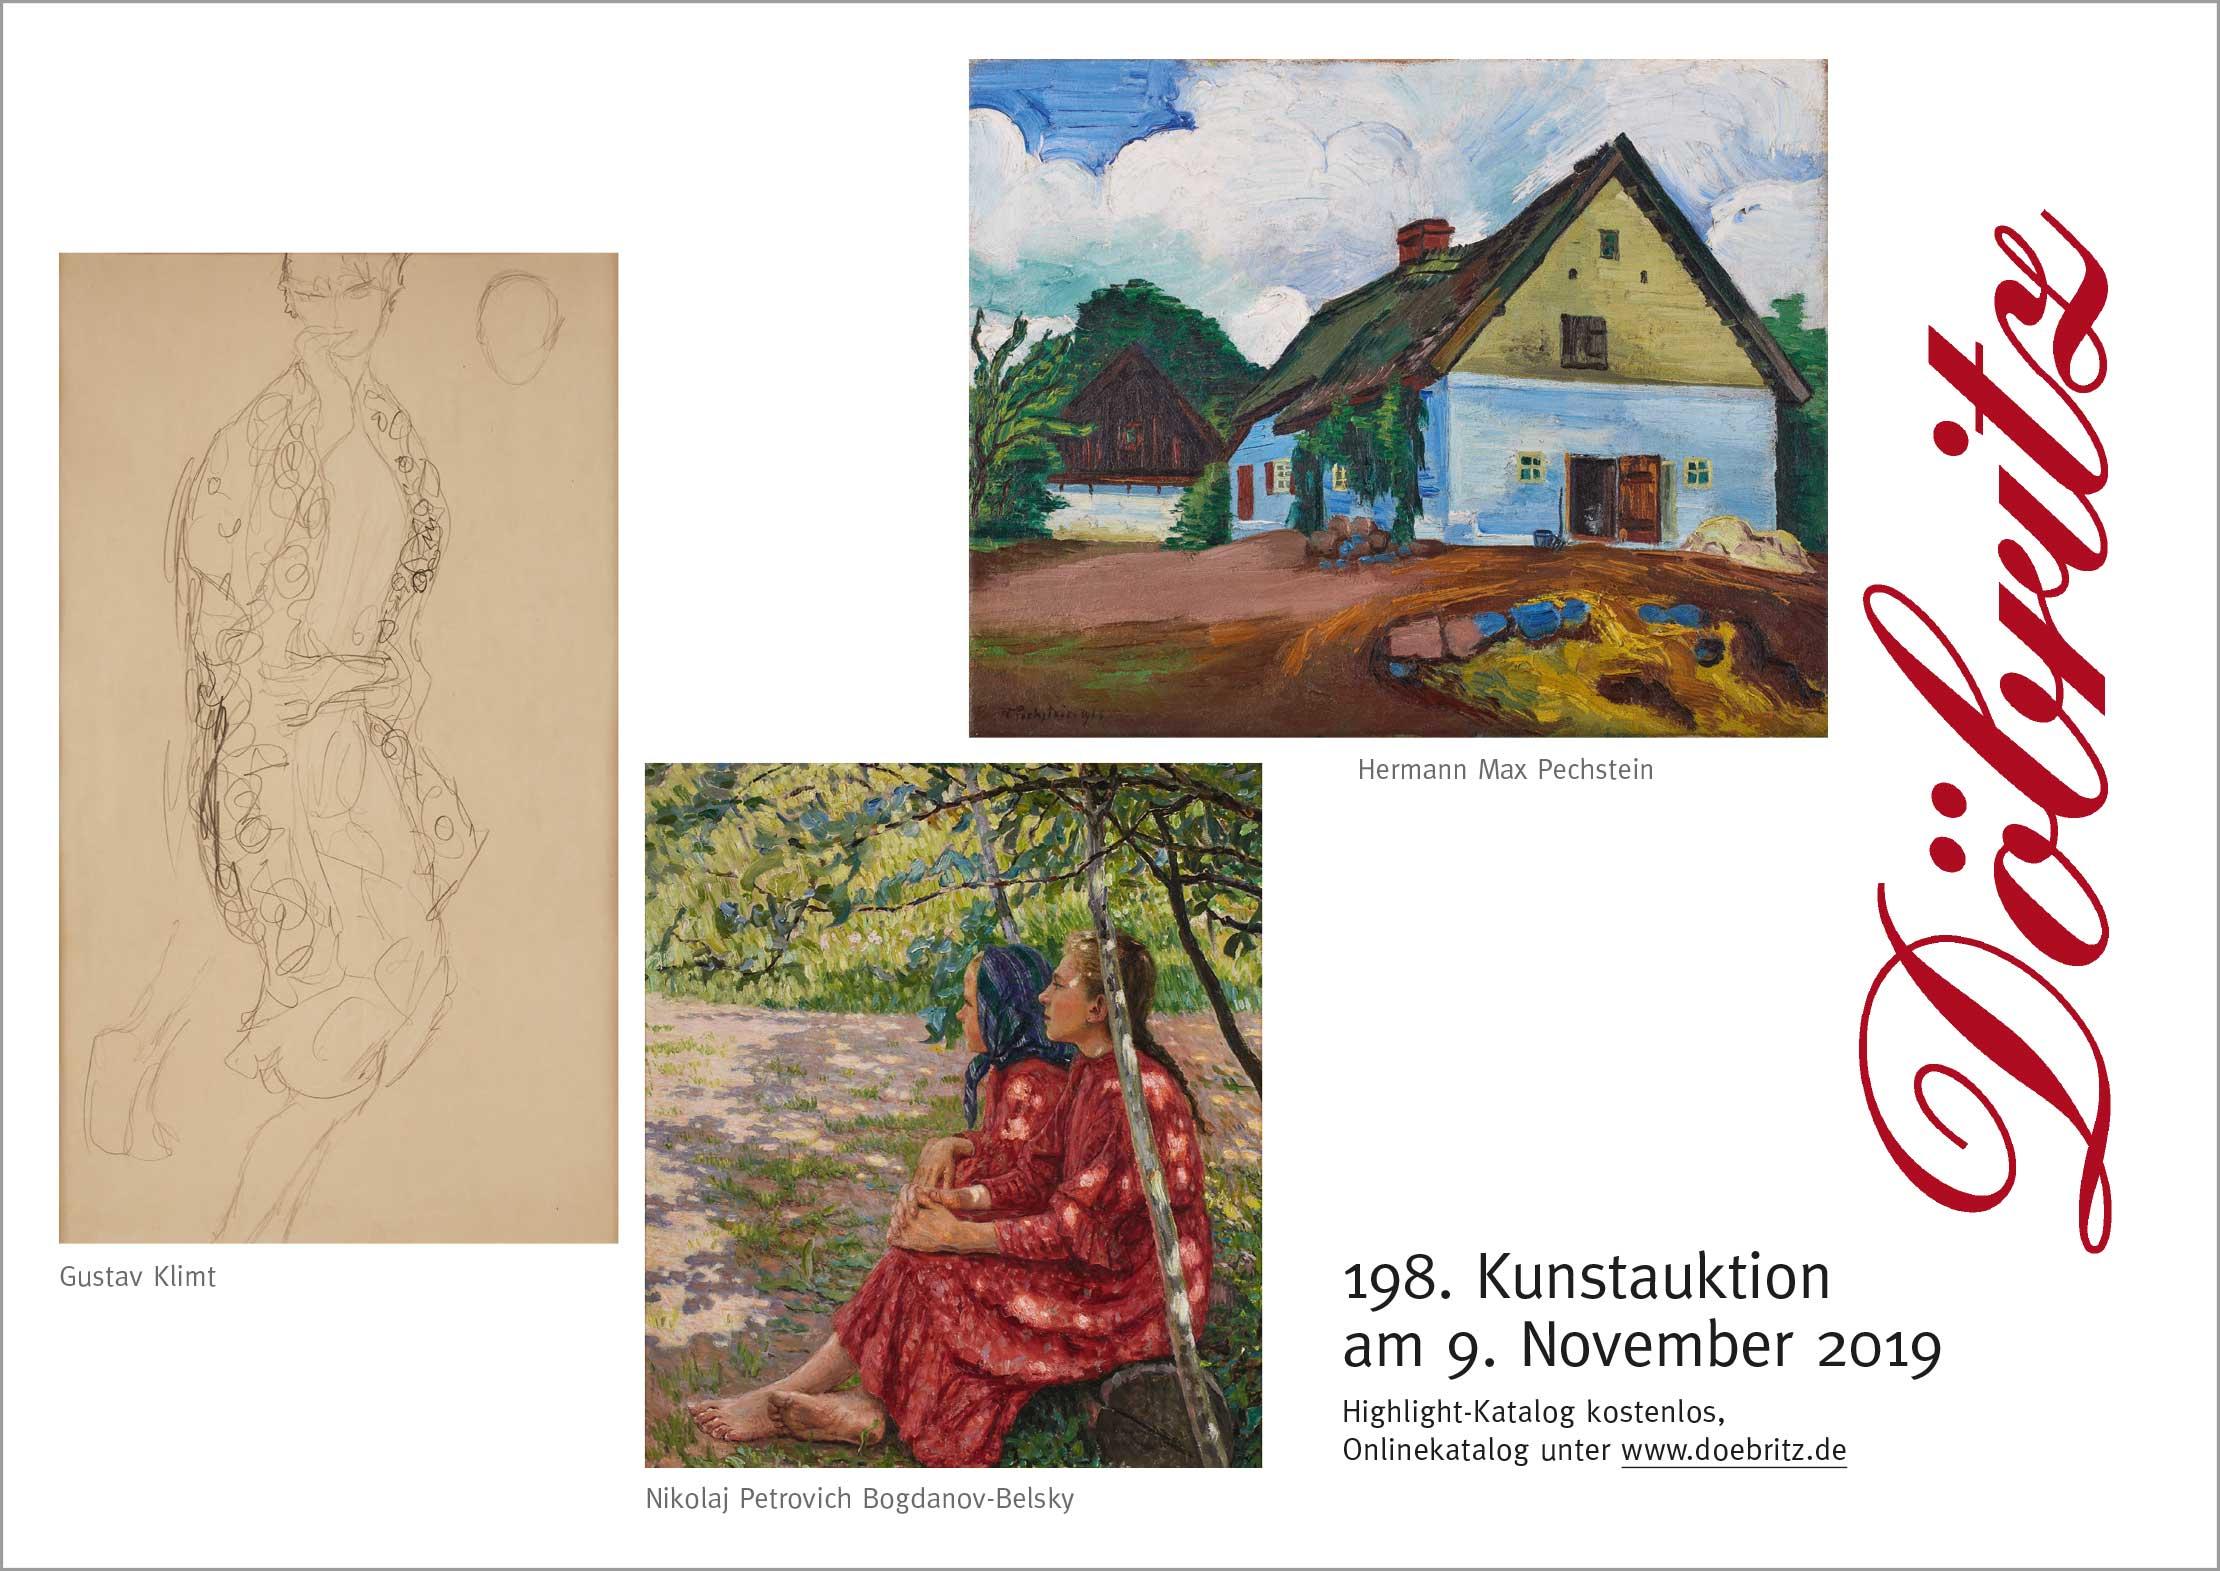 198. Kunstauktion